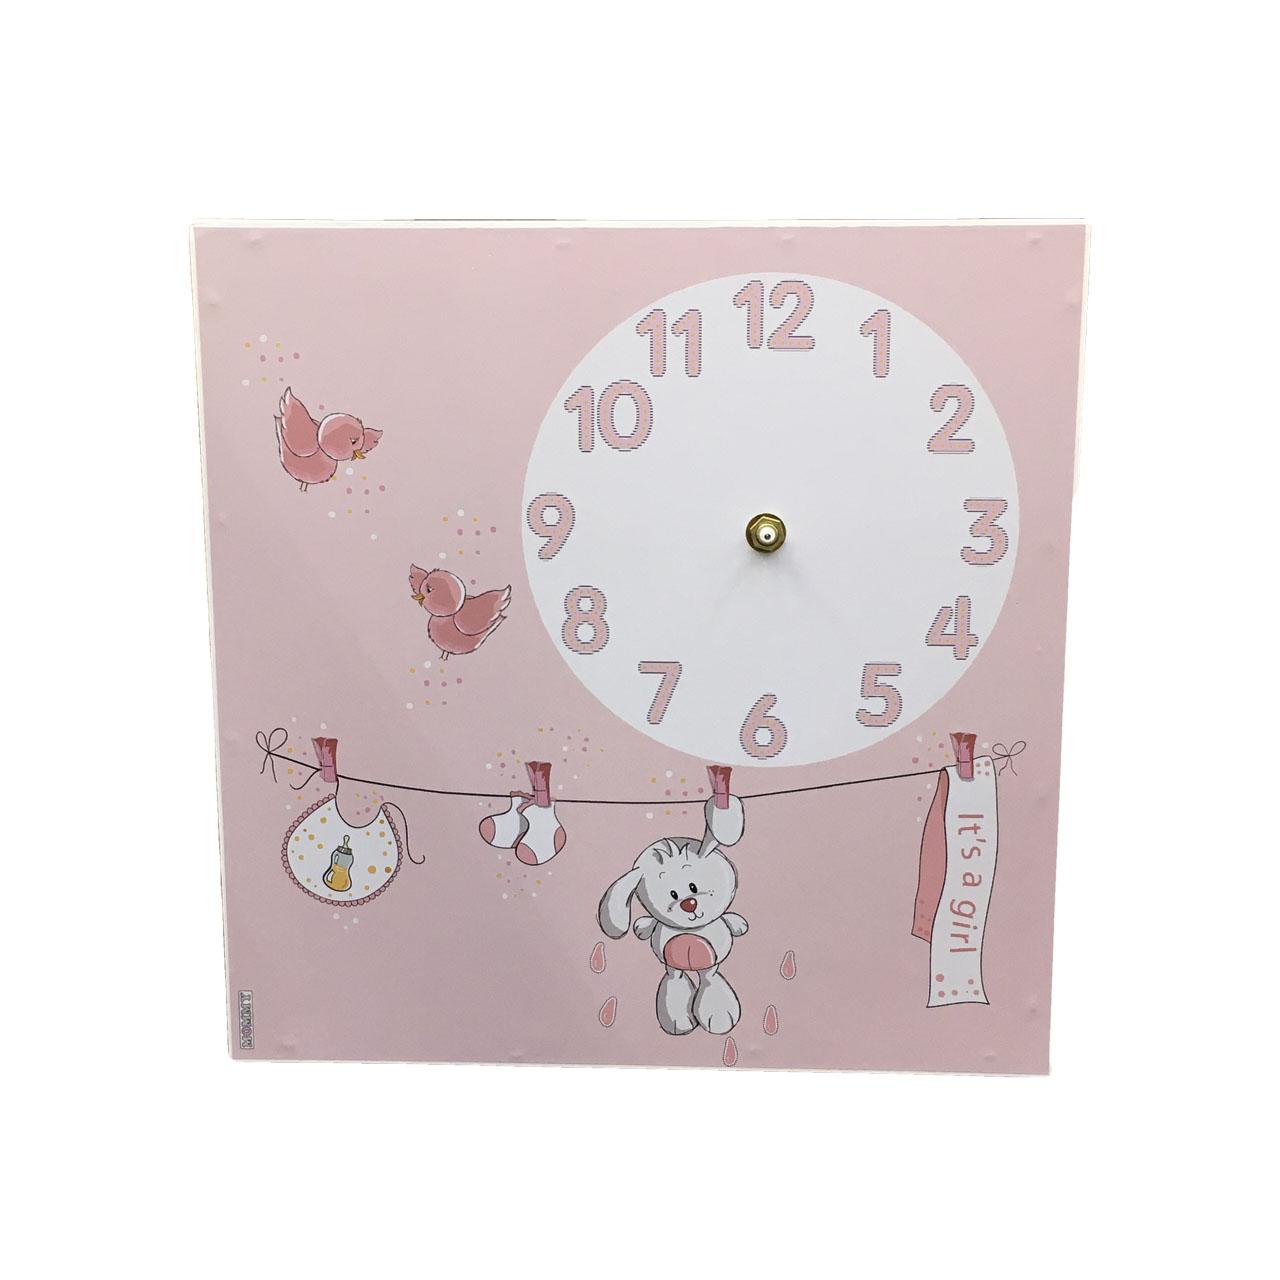 ساعت دیواری کودک طرح خرگوش مدل 3333